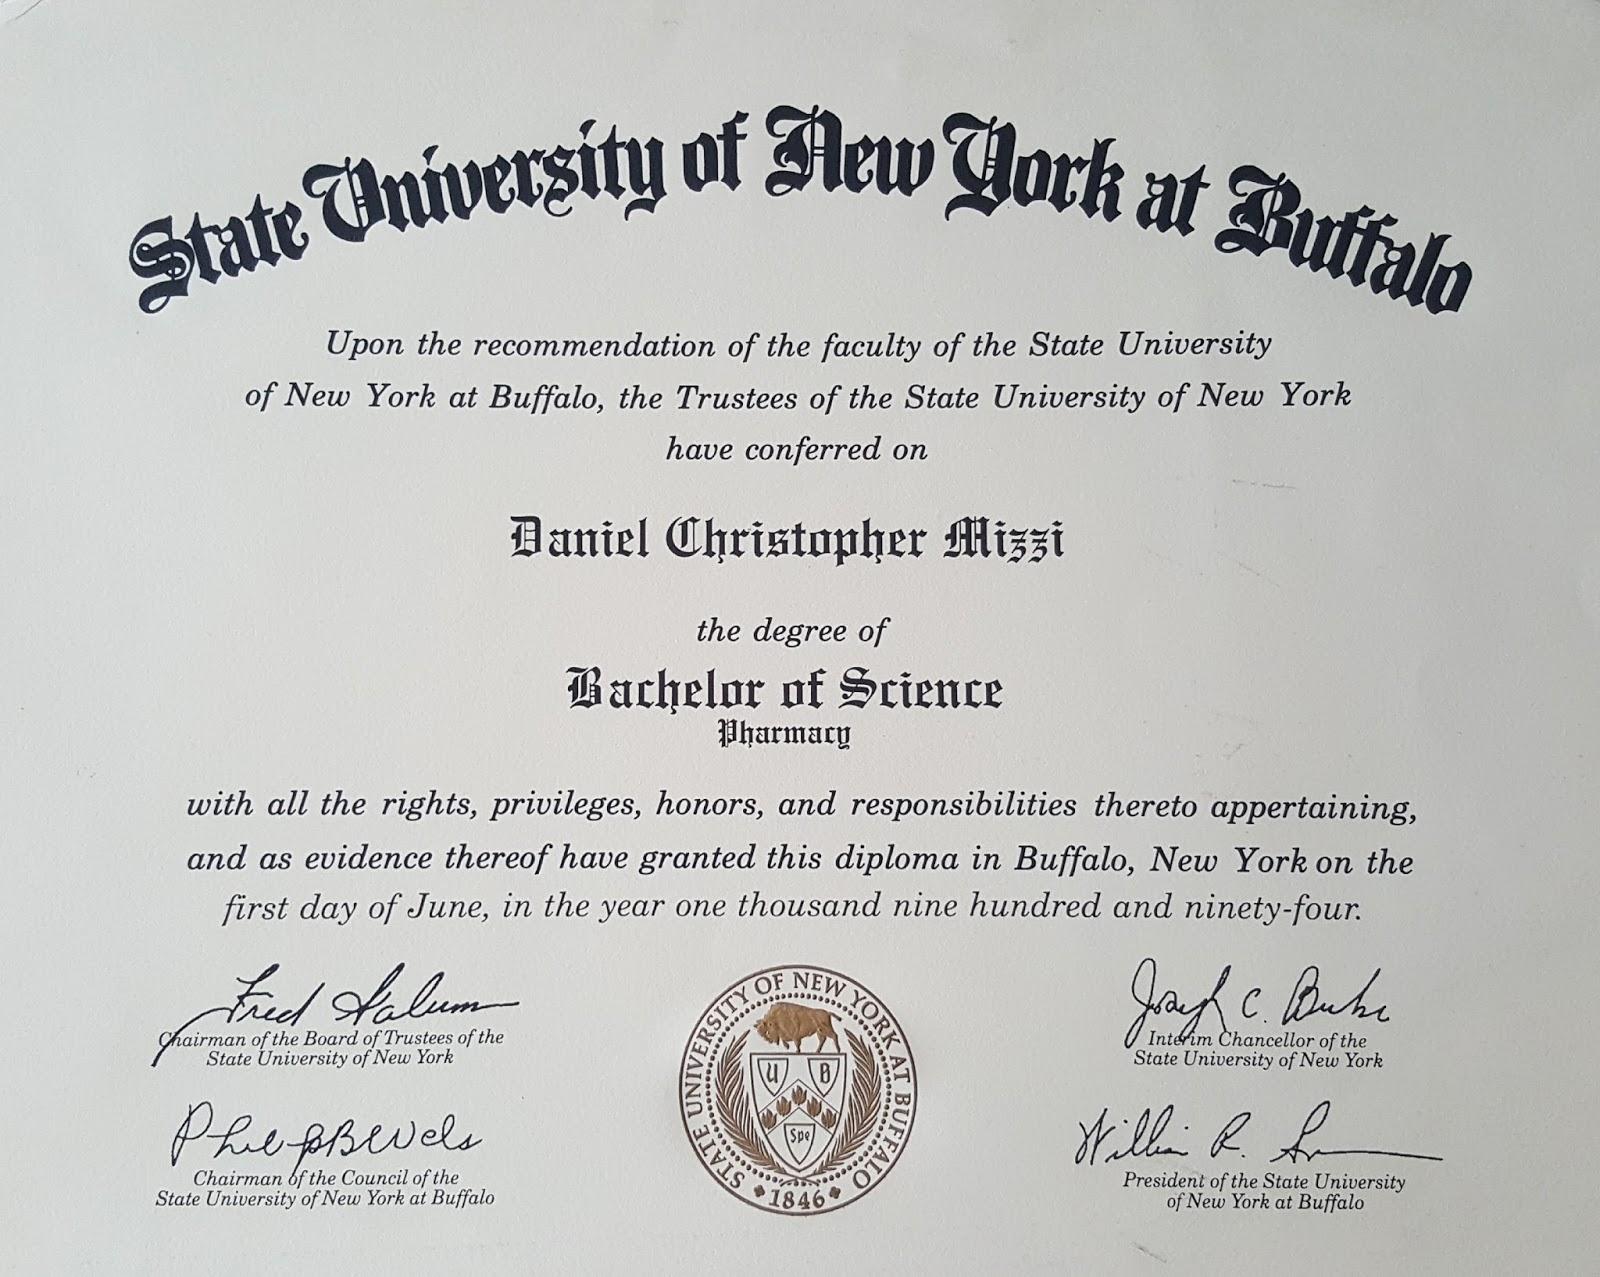 Daniel C. Mizzi, Pharm.D.: CV/Professional Experience